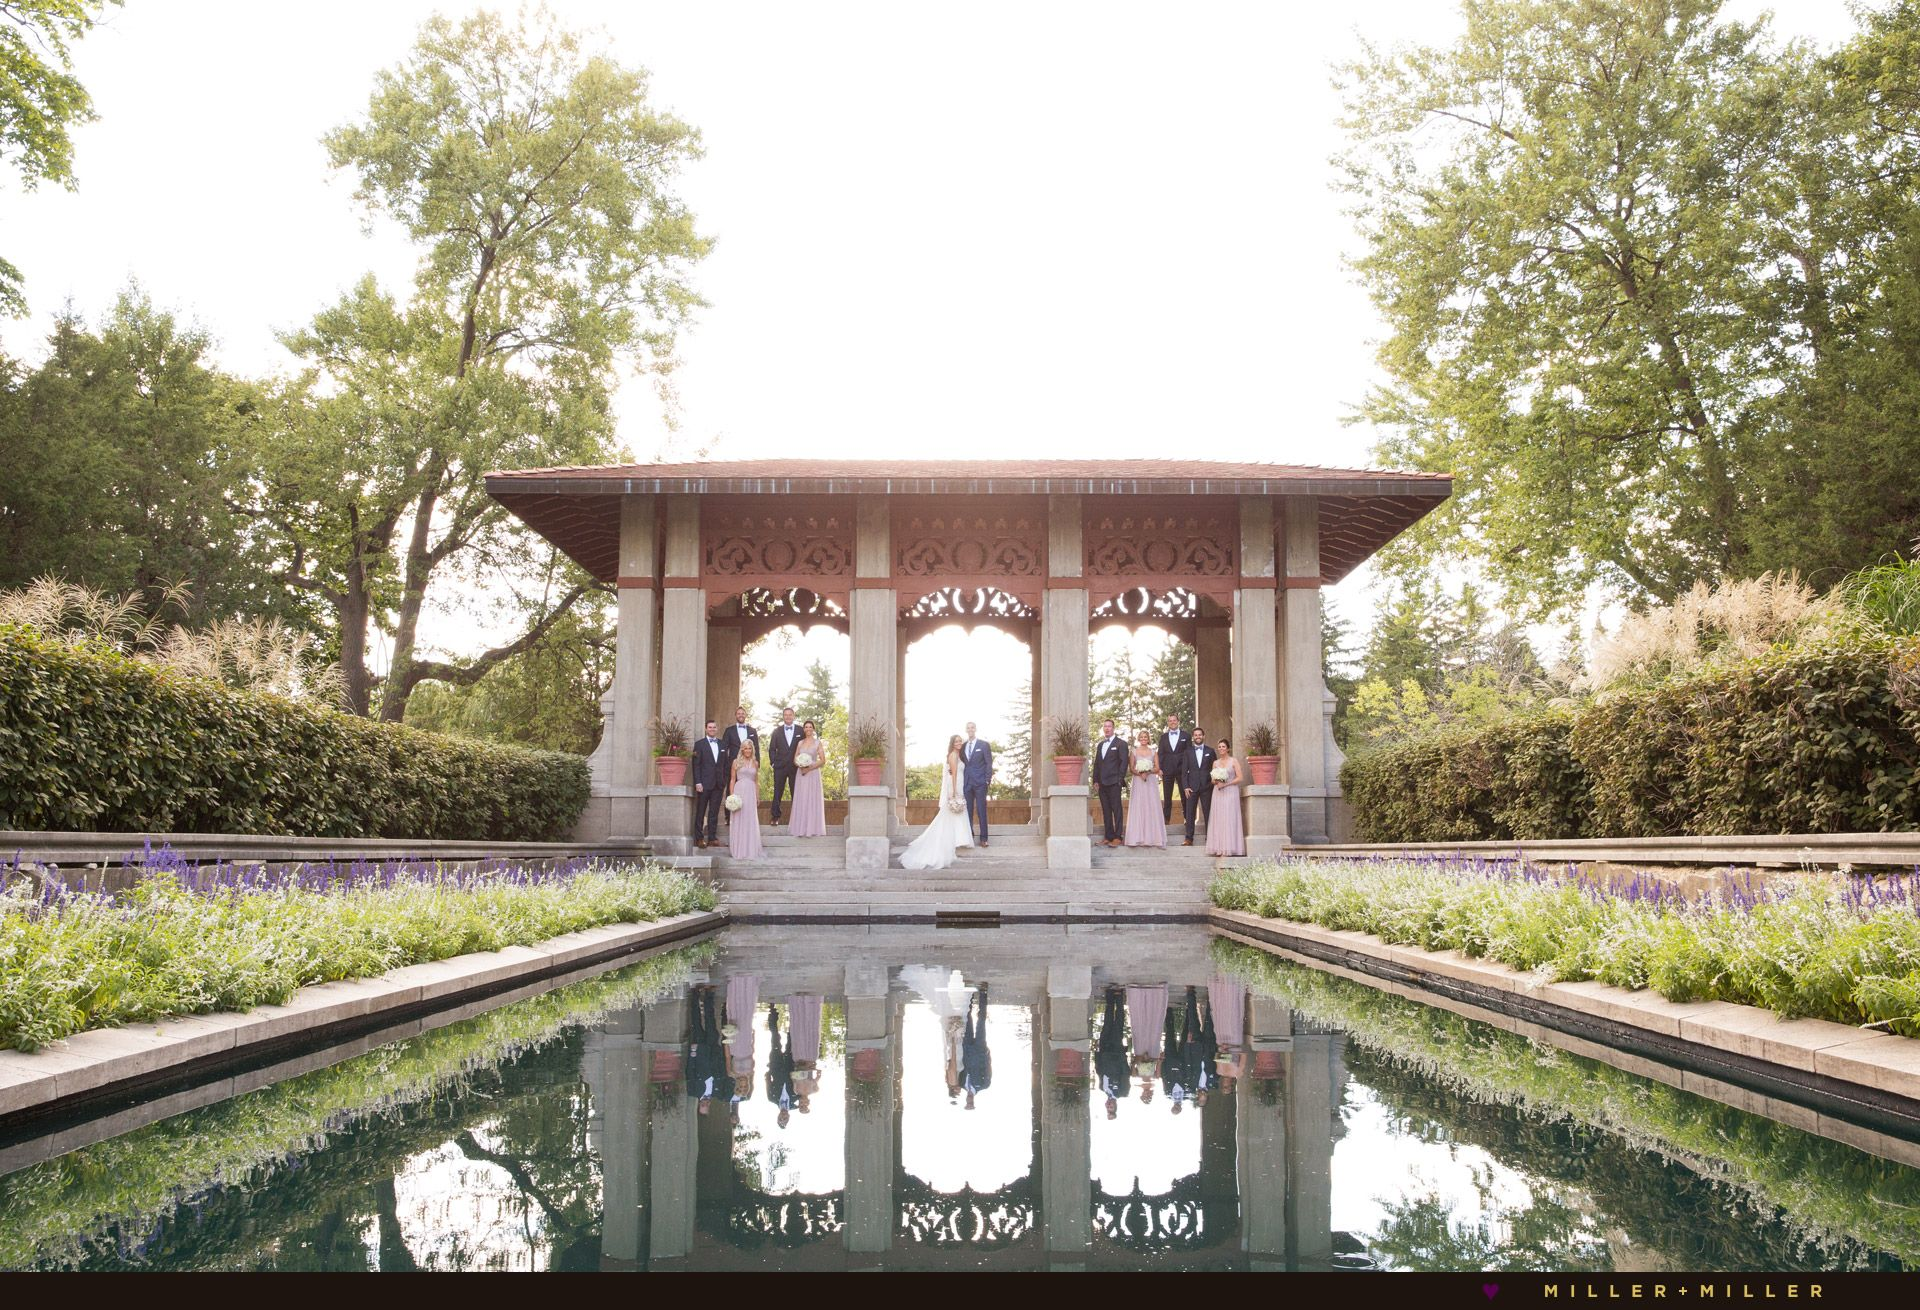 armour house lake forest wedding mansion gardens pergola wedding rh pinterest com